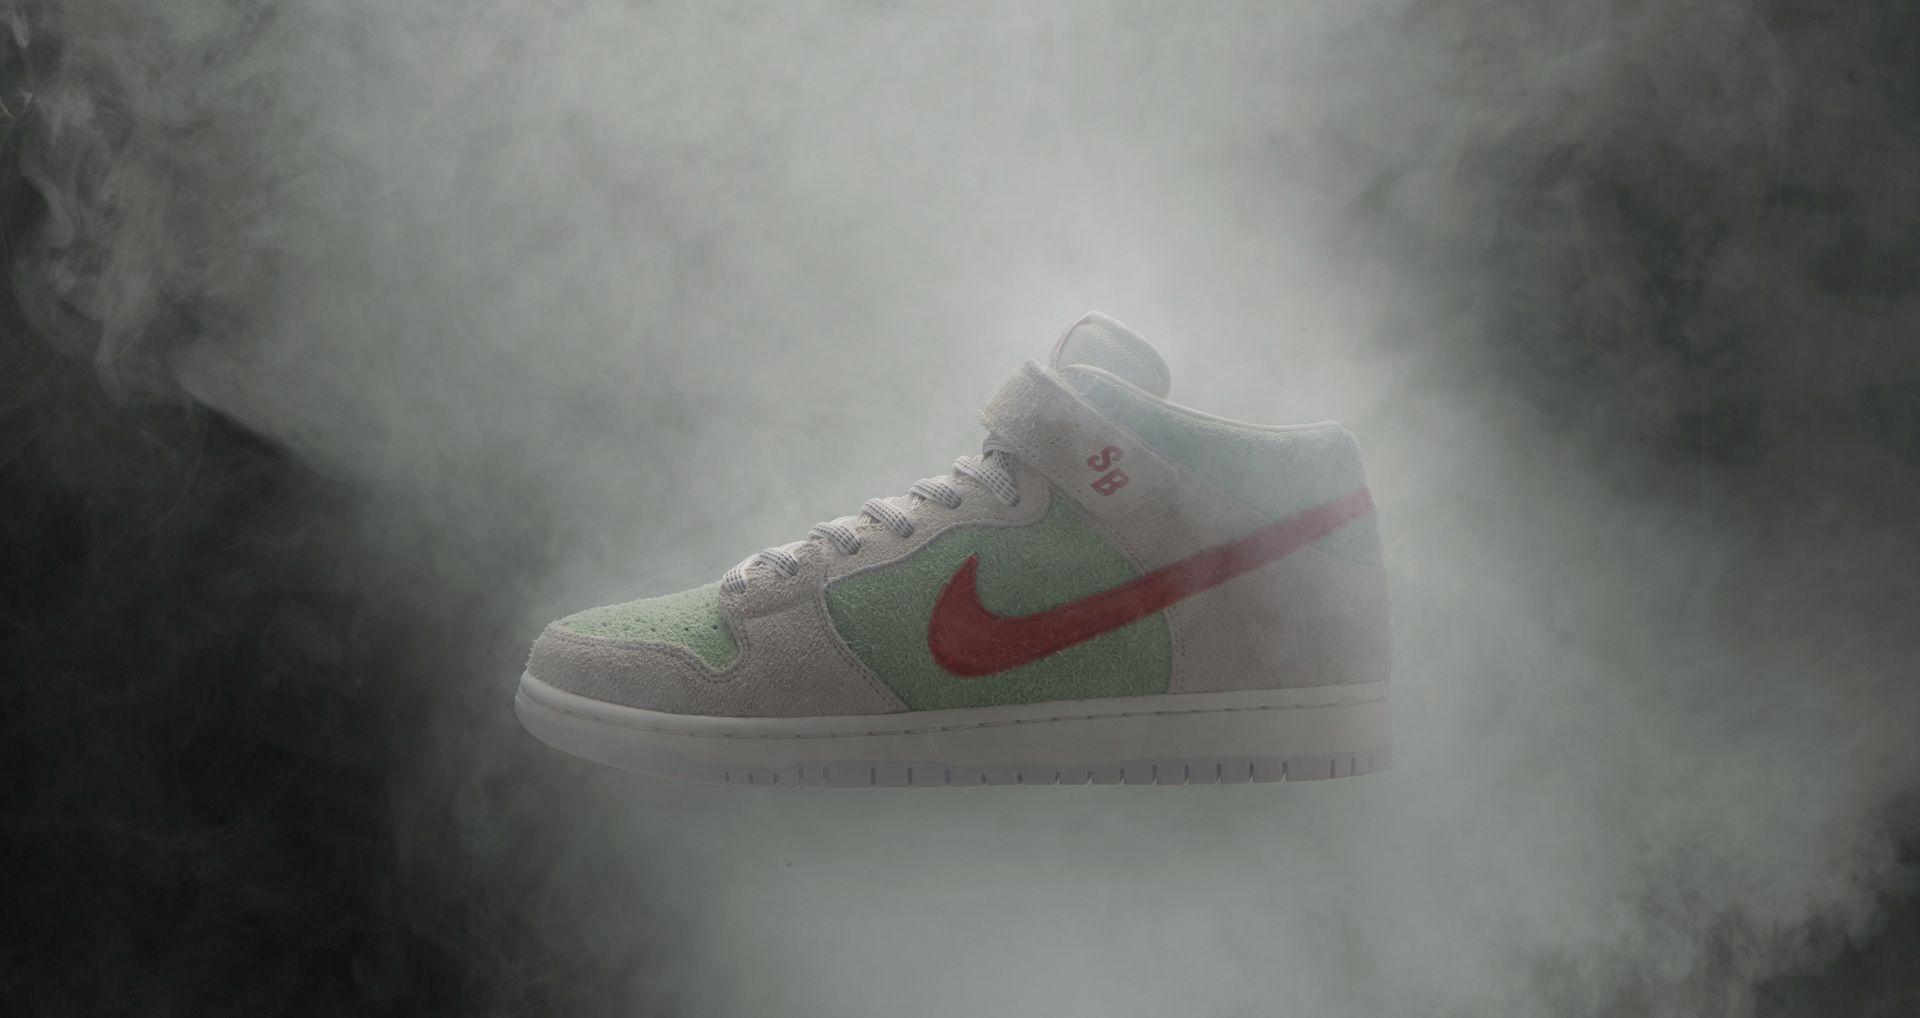 size 40 2fa63 41f6a Nike SB Dunk Mid Pro Todd Bratrud  White Widow  Release Date. Nike+ ...